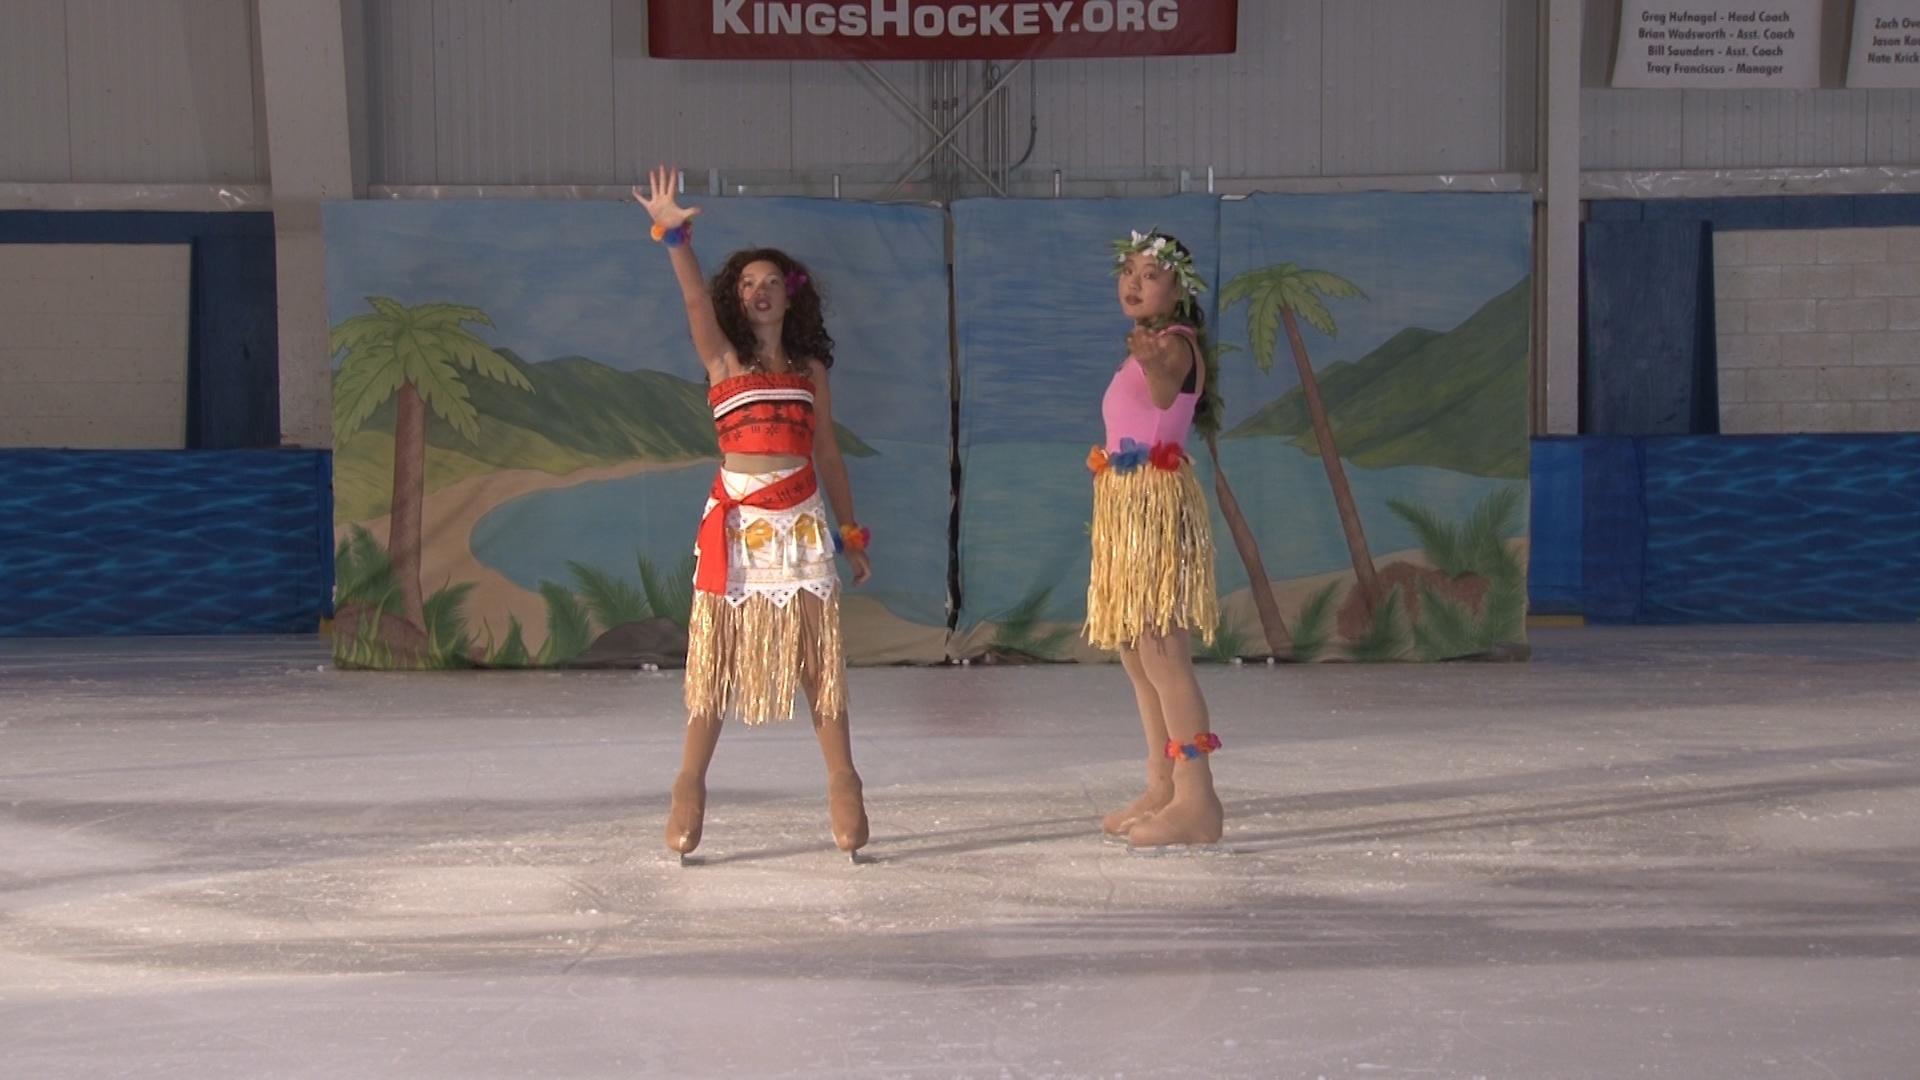 Power Play Maui Skate on Ice 071417.00_16_52_26.Still031.jpg